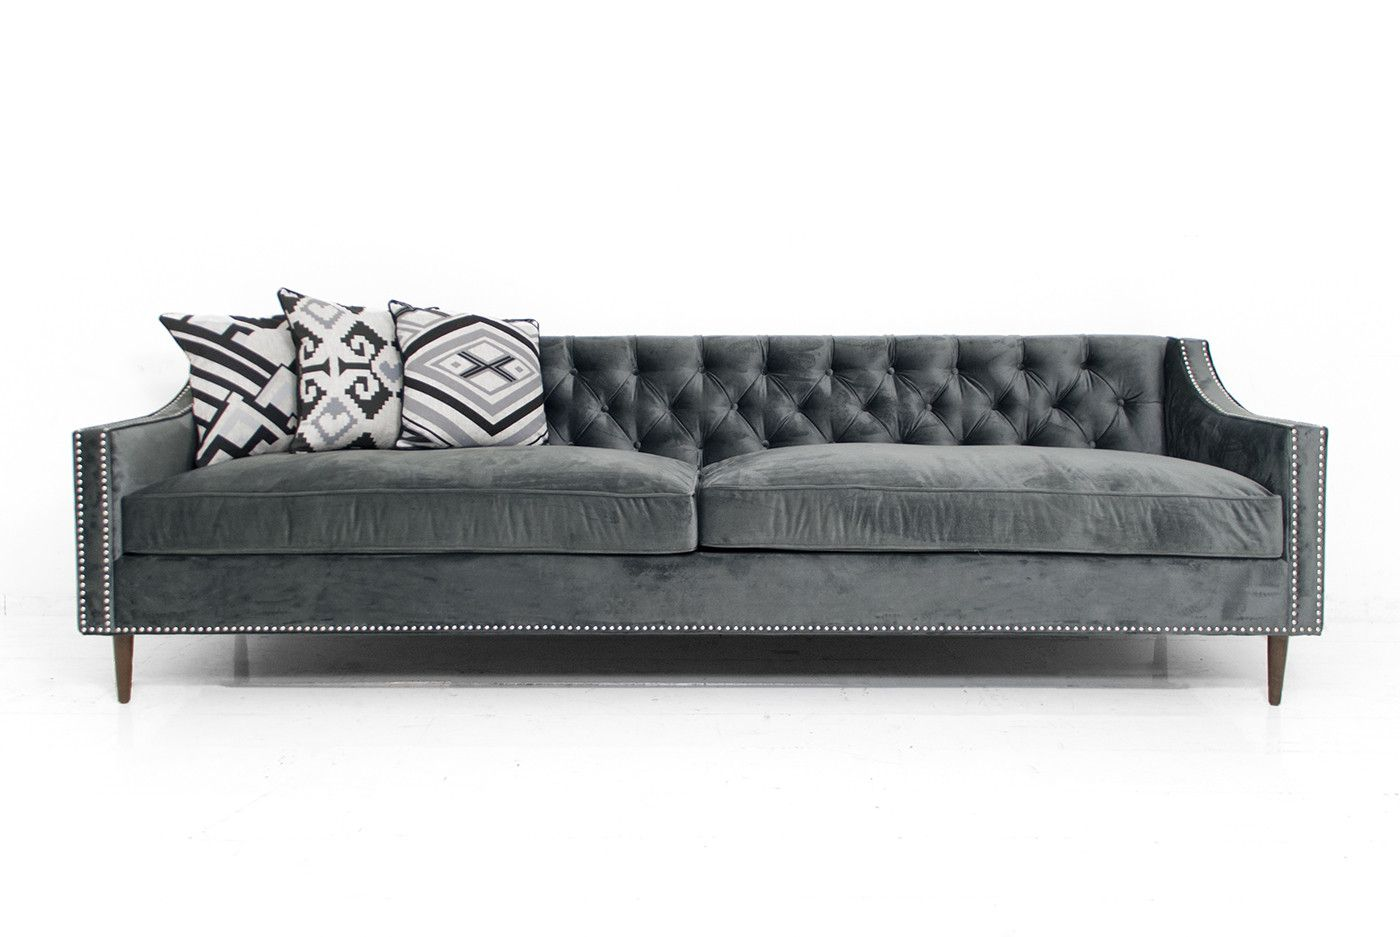 loveseat bedroom back design red large high bench of velvet settee gray size blue set tufted navy sofa full seat couch love modern